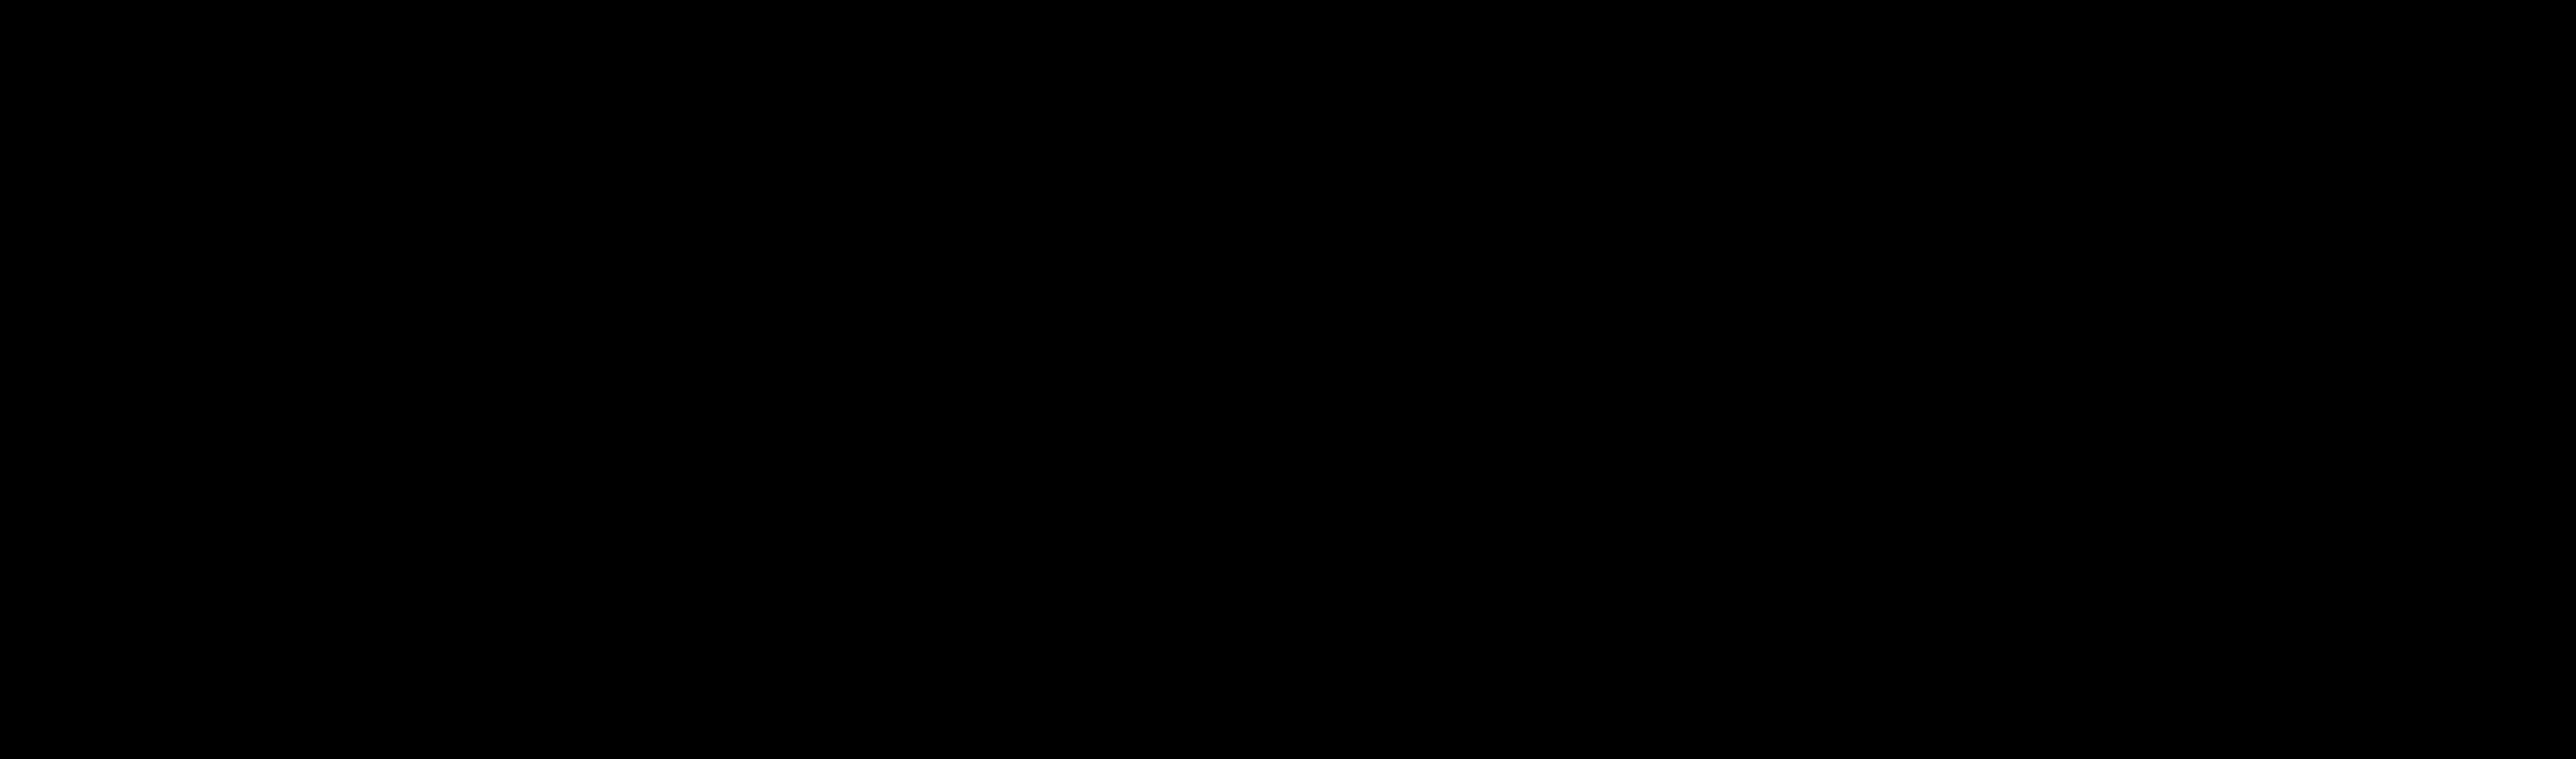 N-(10-Dansylamino)decyl-1-oleamide